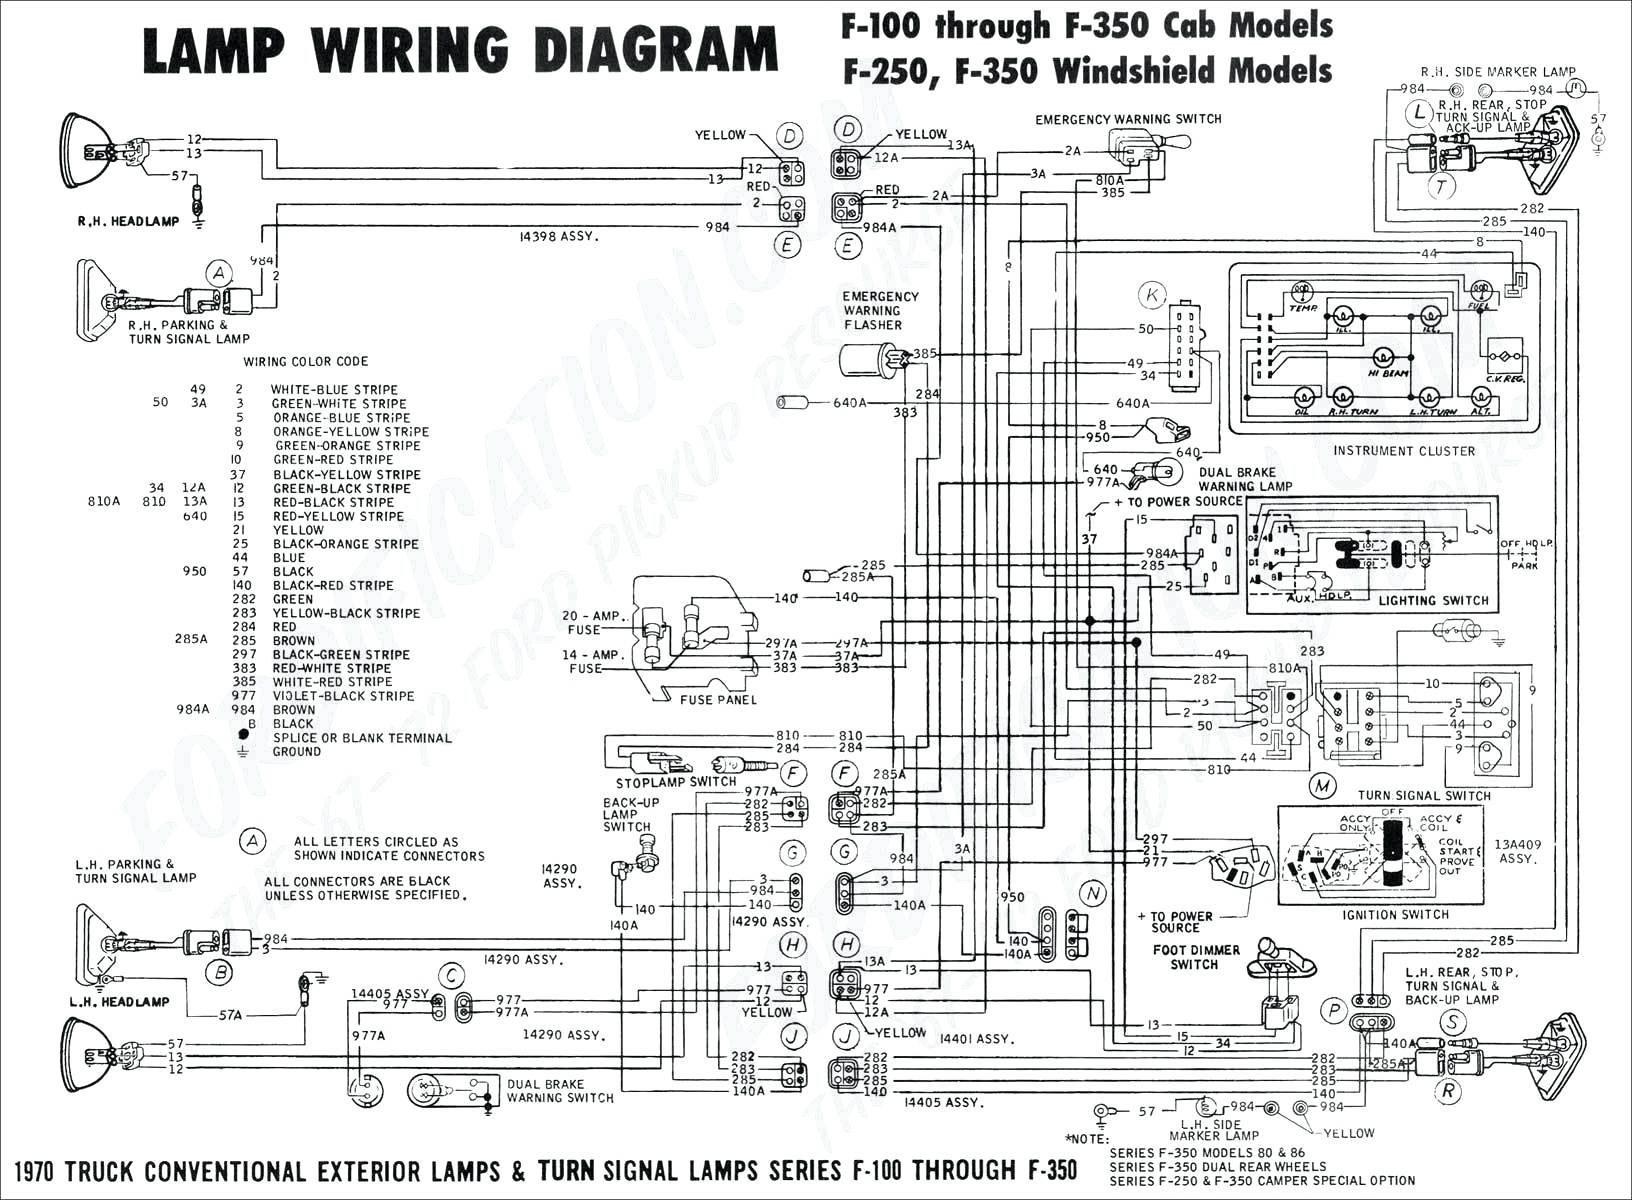 06 F250 Mirror Switch Wiring